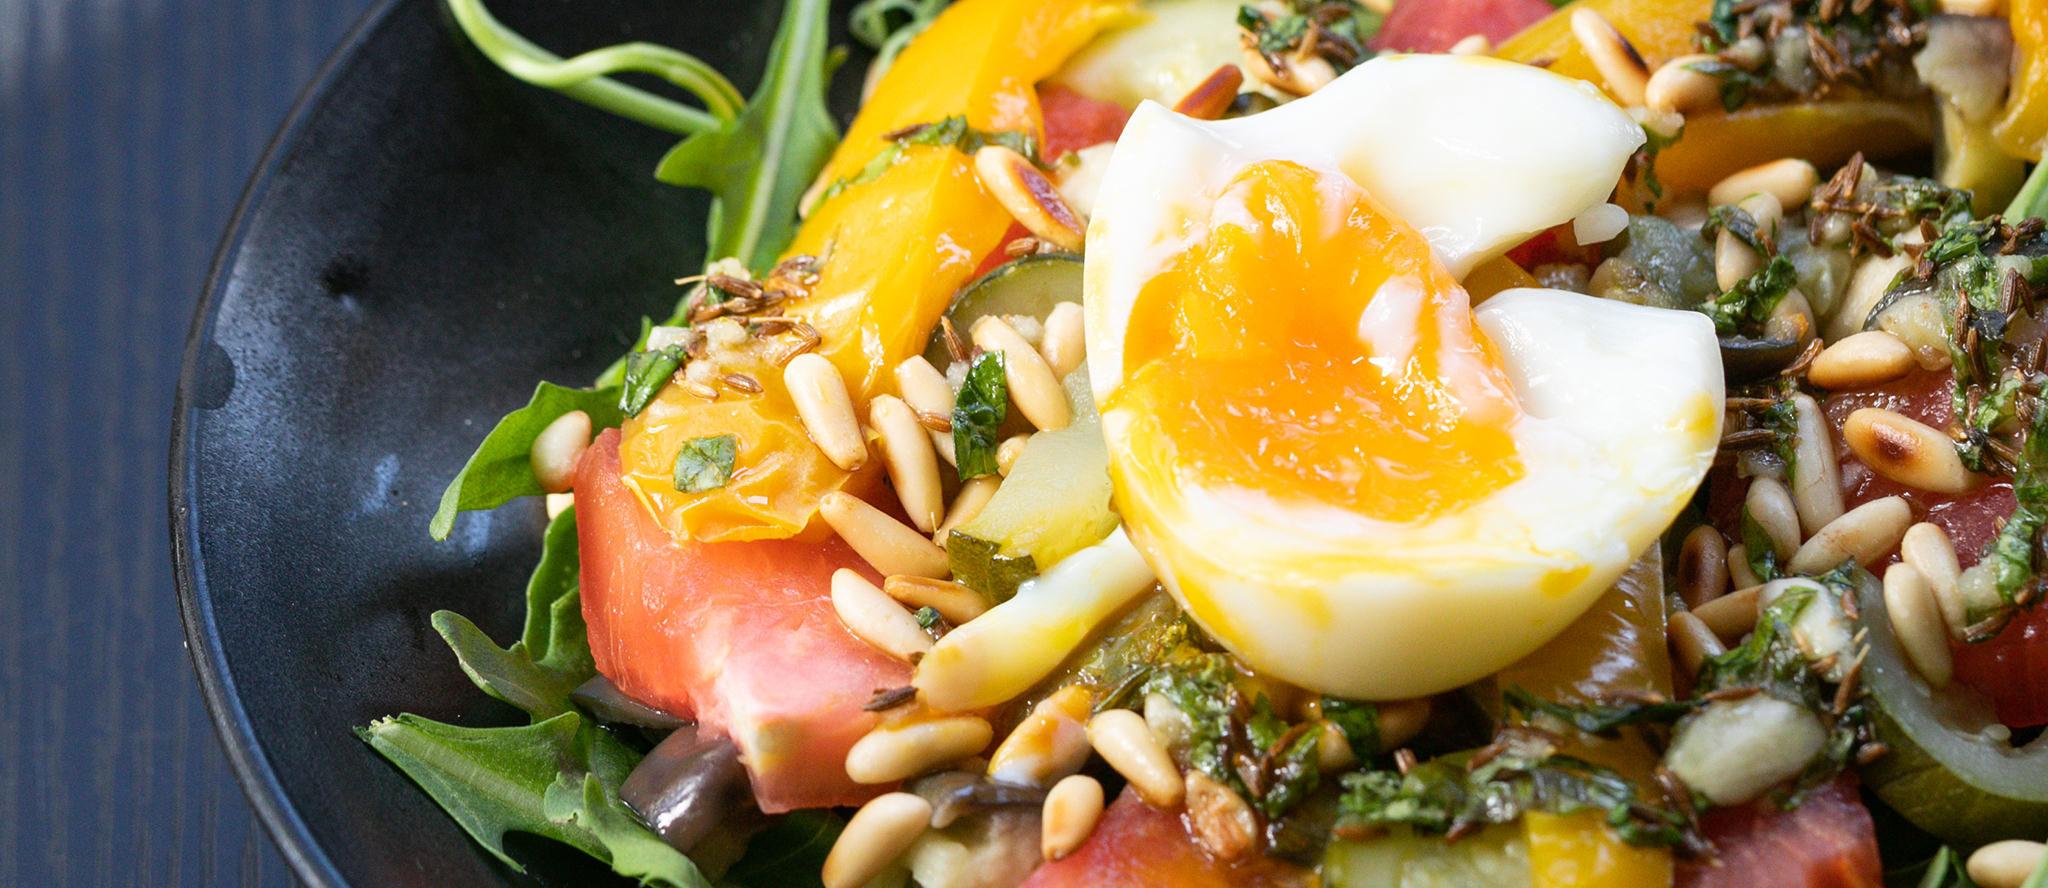 Saladeprovencale2048